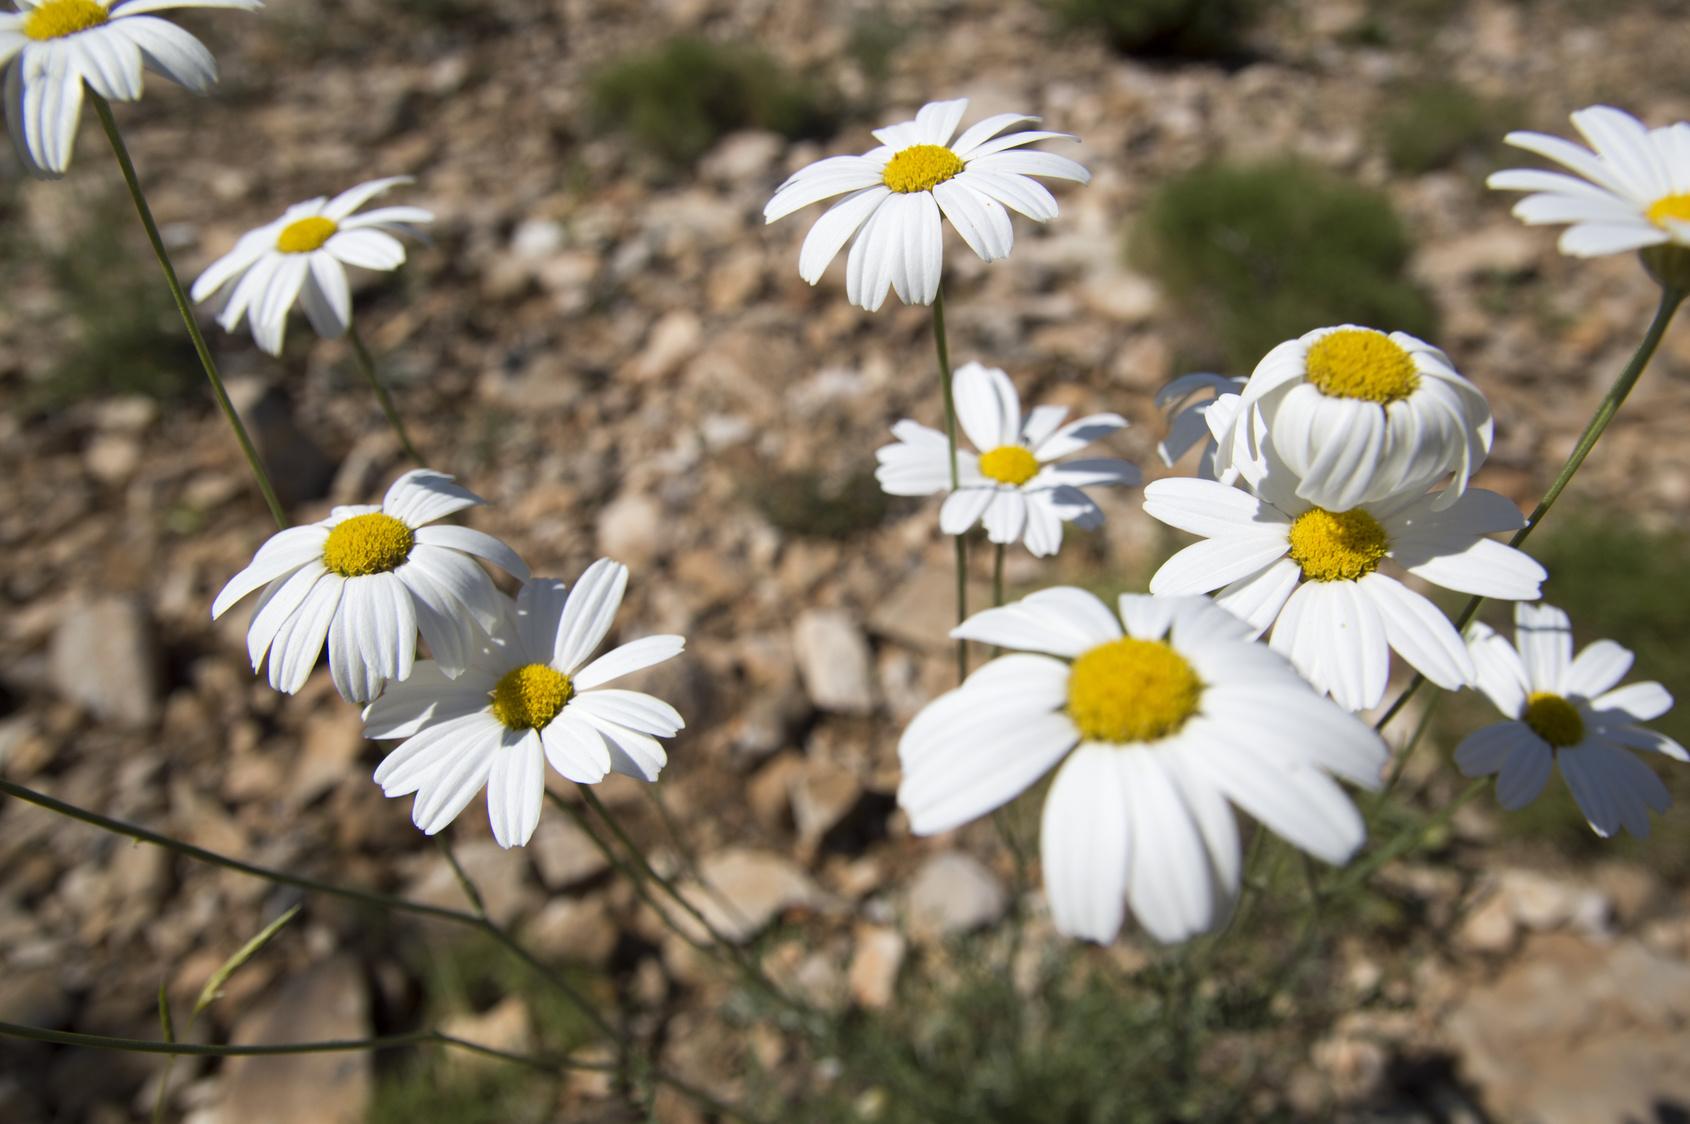 Dalmatian pyrethrum daisy (Tanacetum, Chrysanthemum cinerariifolium